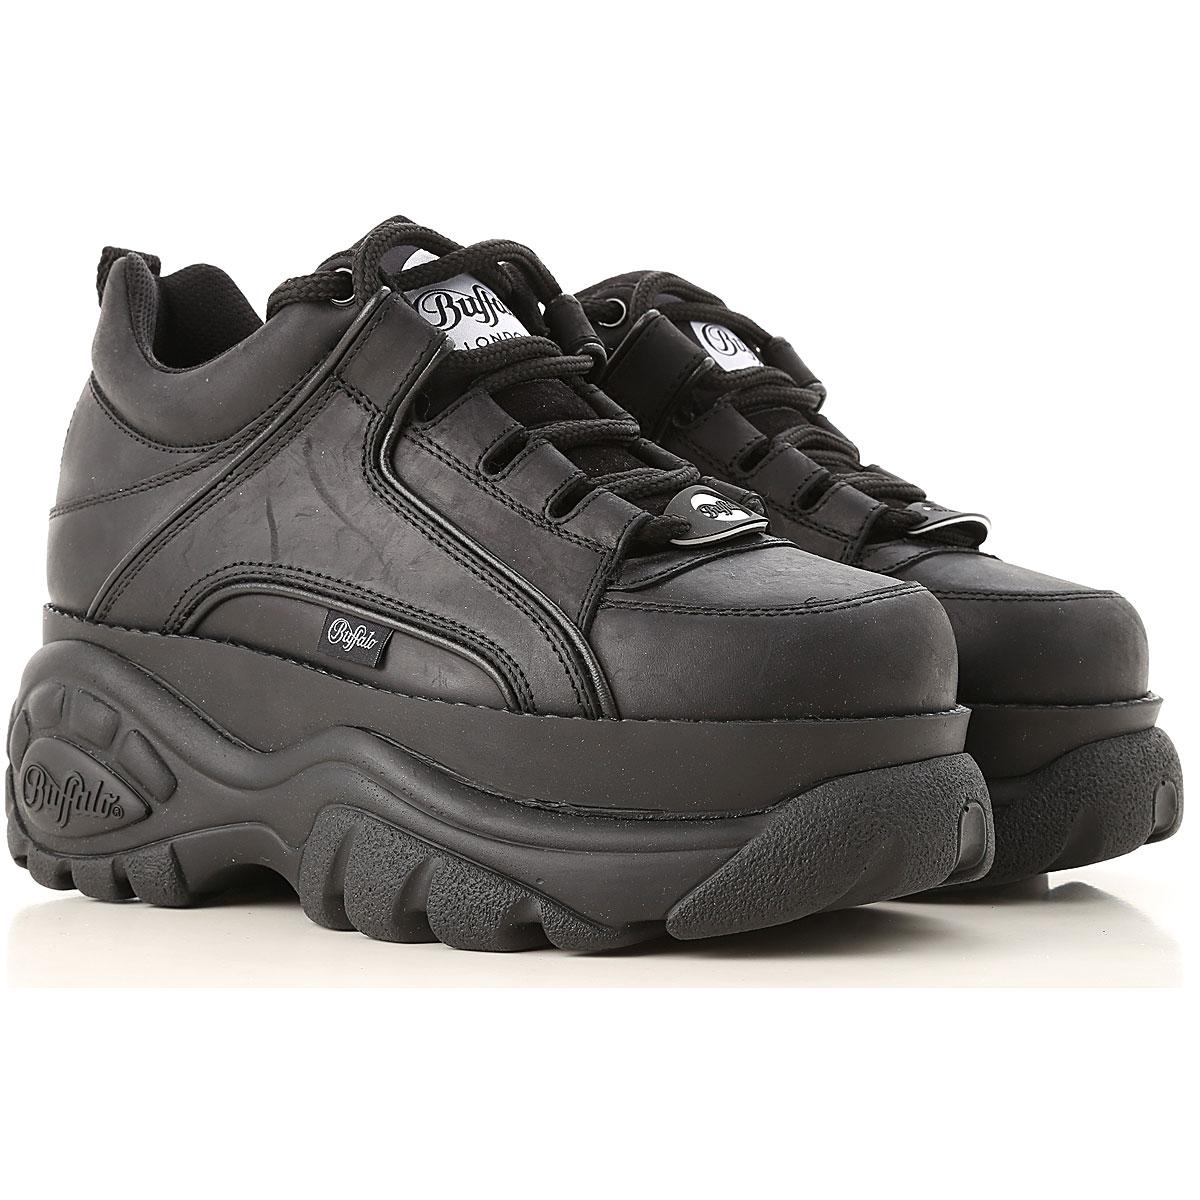 Image of Buffalo Sneakers for Women, Black, Leather, 2017, UK 3 - EU 36 - US 6 UK 4 - EU 37 - US 7 UK 5 - EU 38 - US 8 UK 6 - EU 39 - US 9 UK 7 - EU 40 - US 10